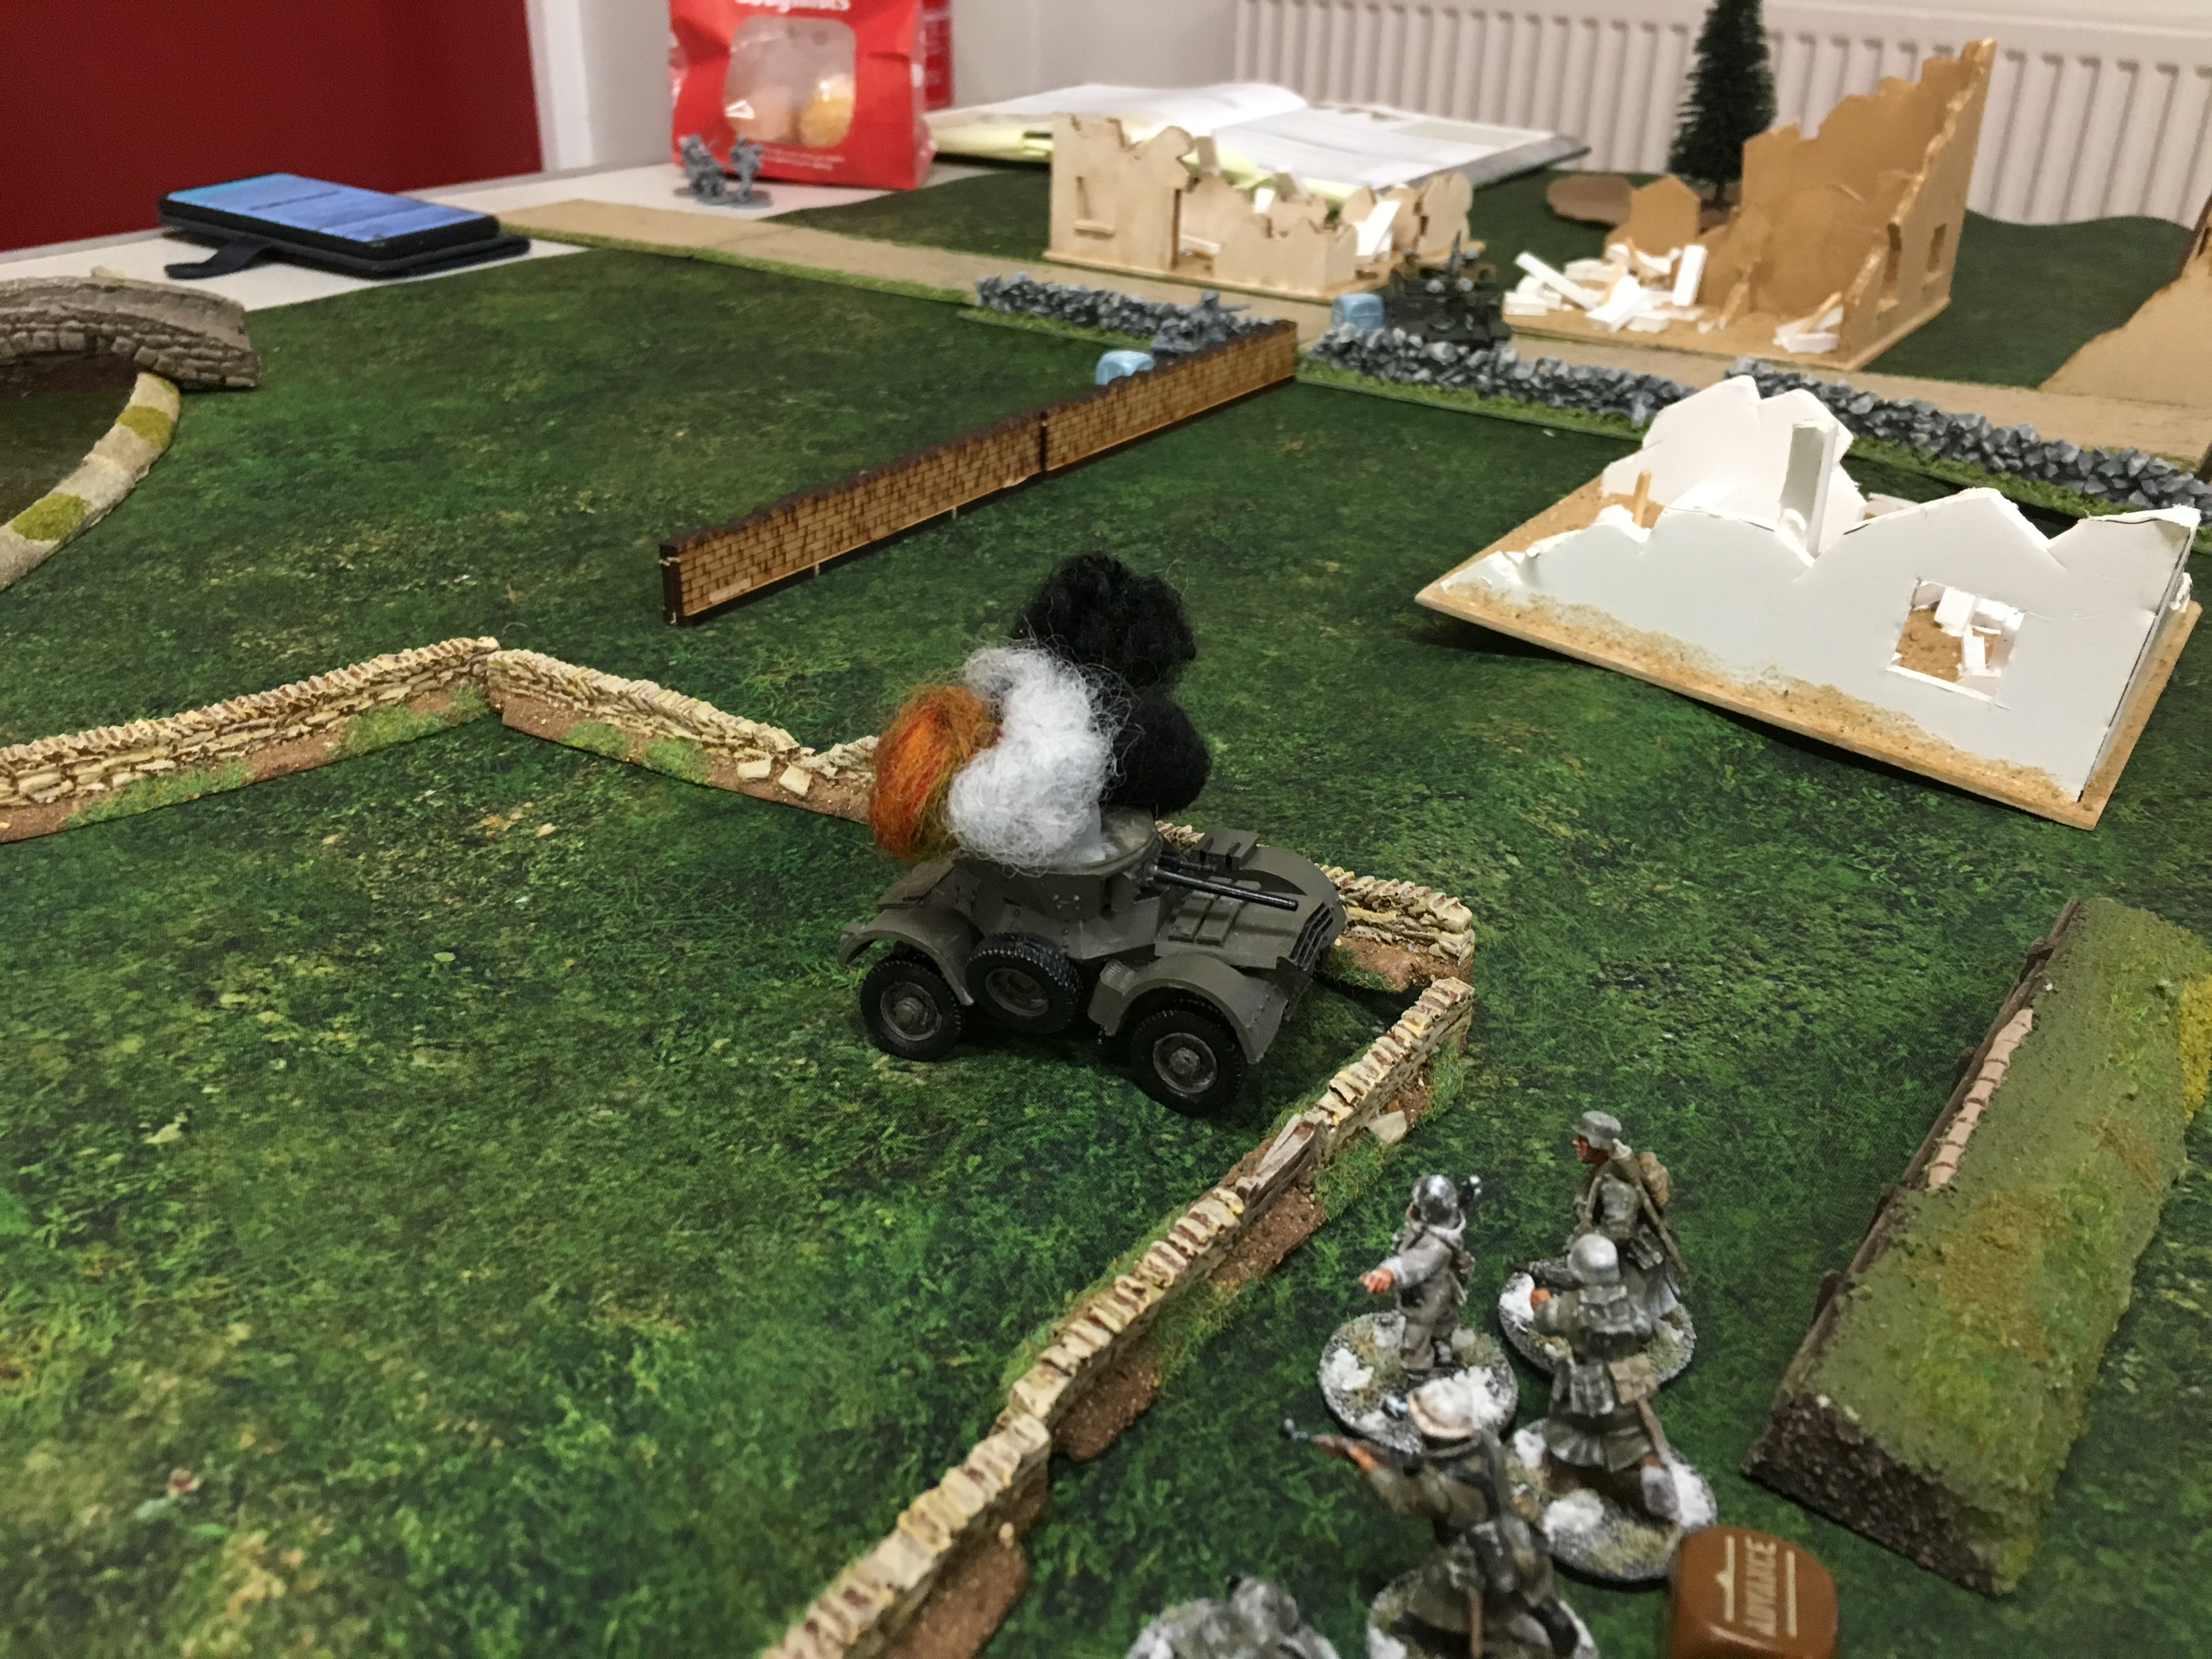 German grenadier's versus 2nd light rifles in a fierce infantry engagement